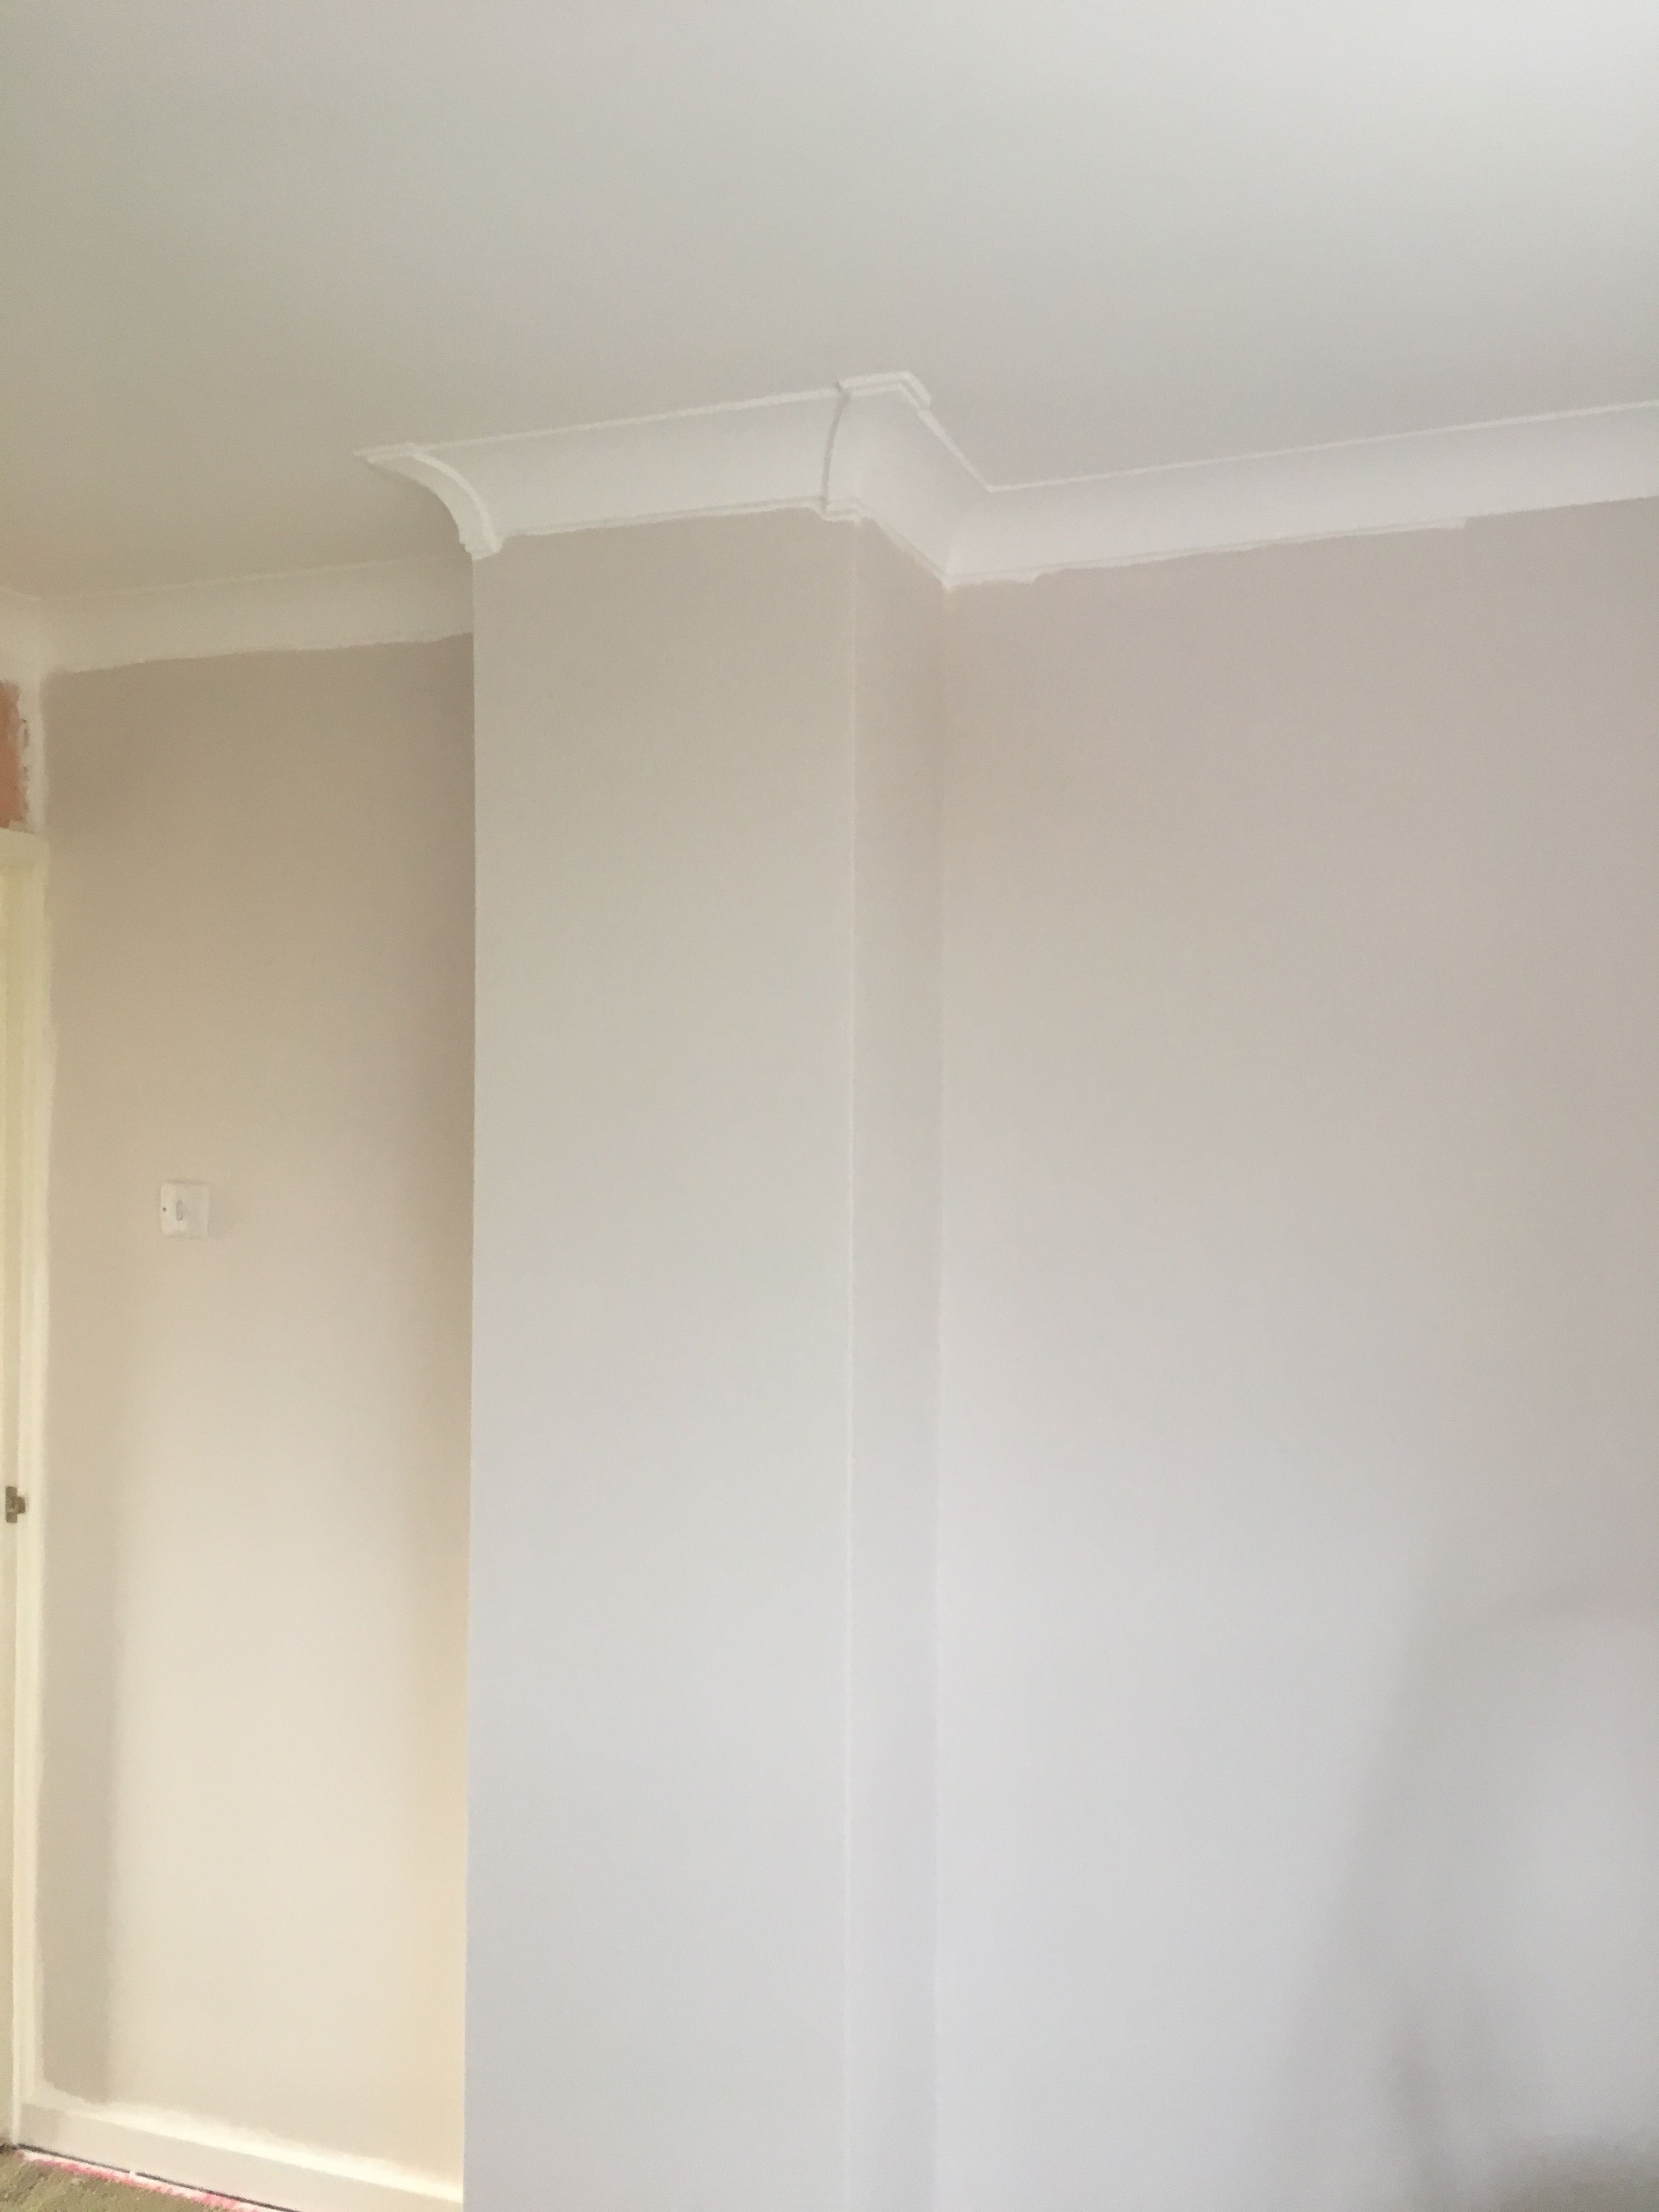 Dulux Nutmeg White In 2019 Dulux Nutmeg White Hallway